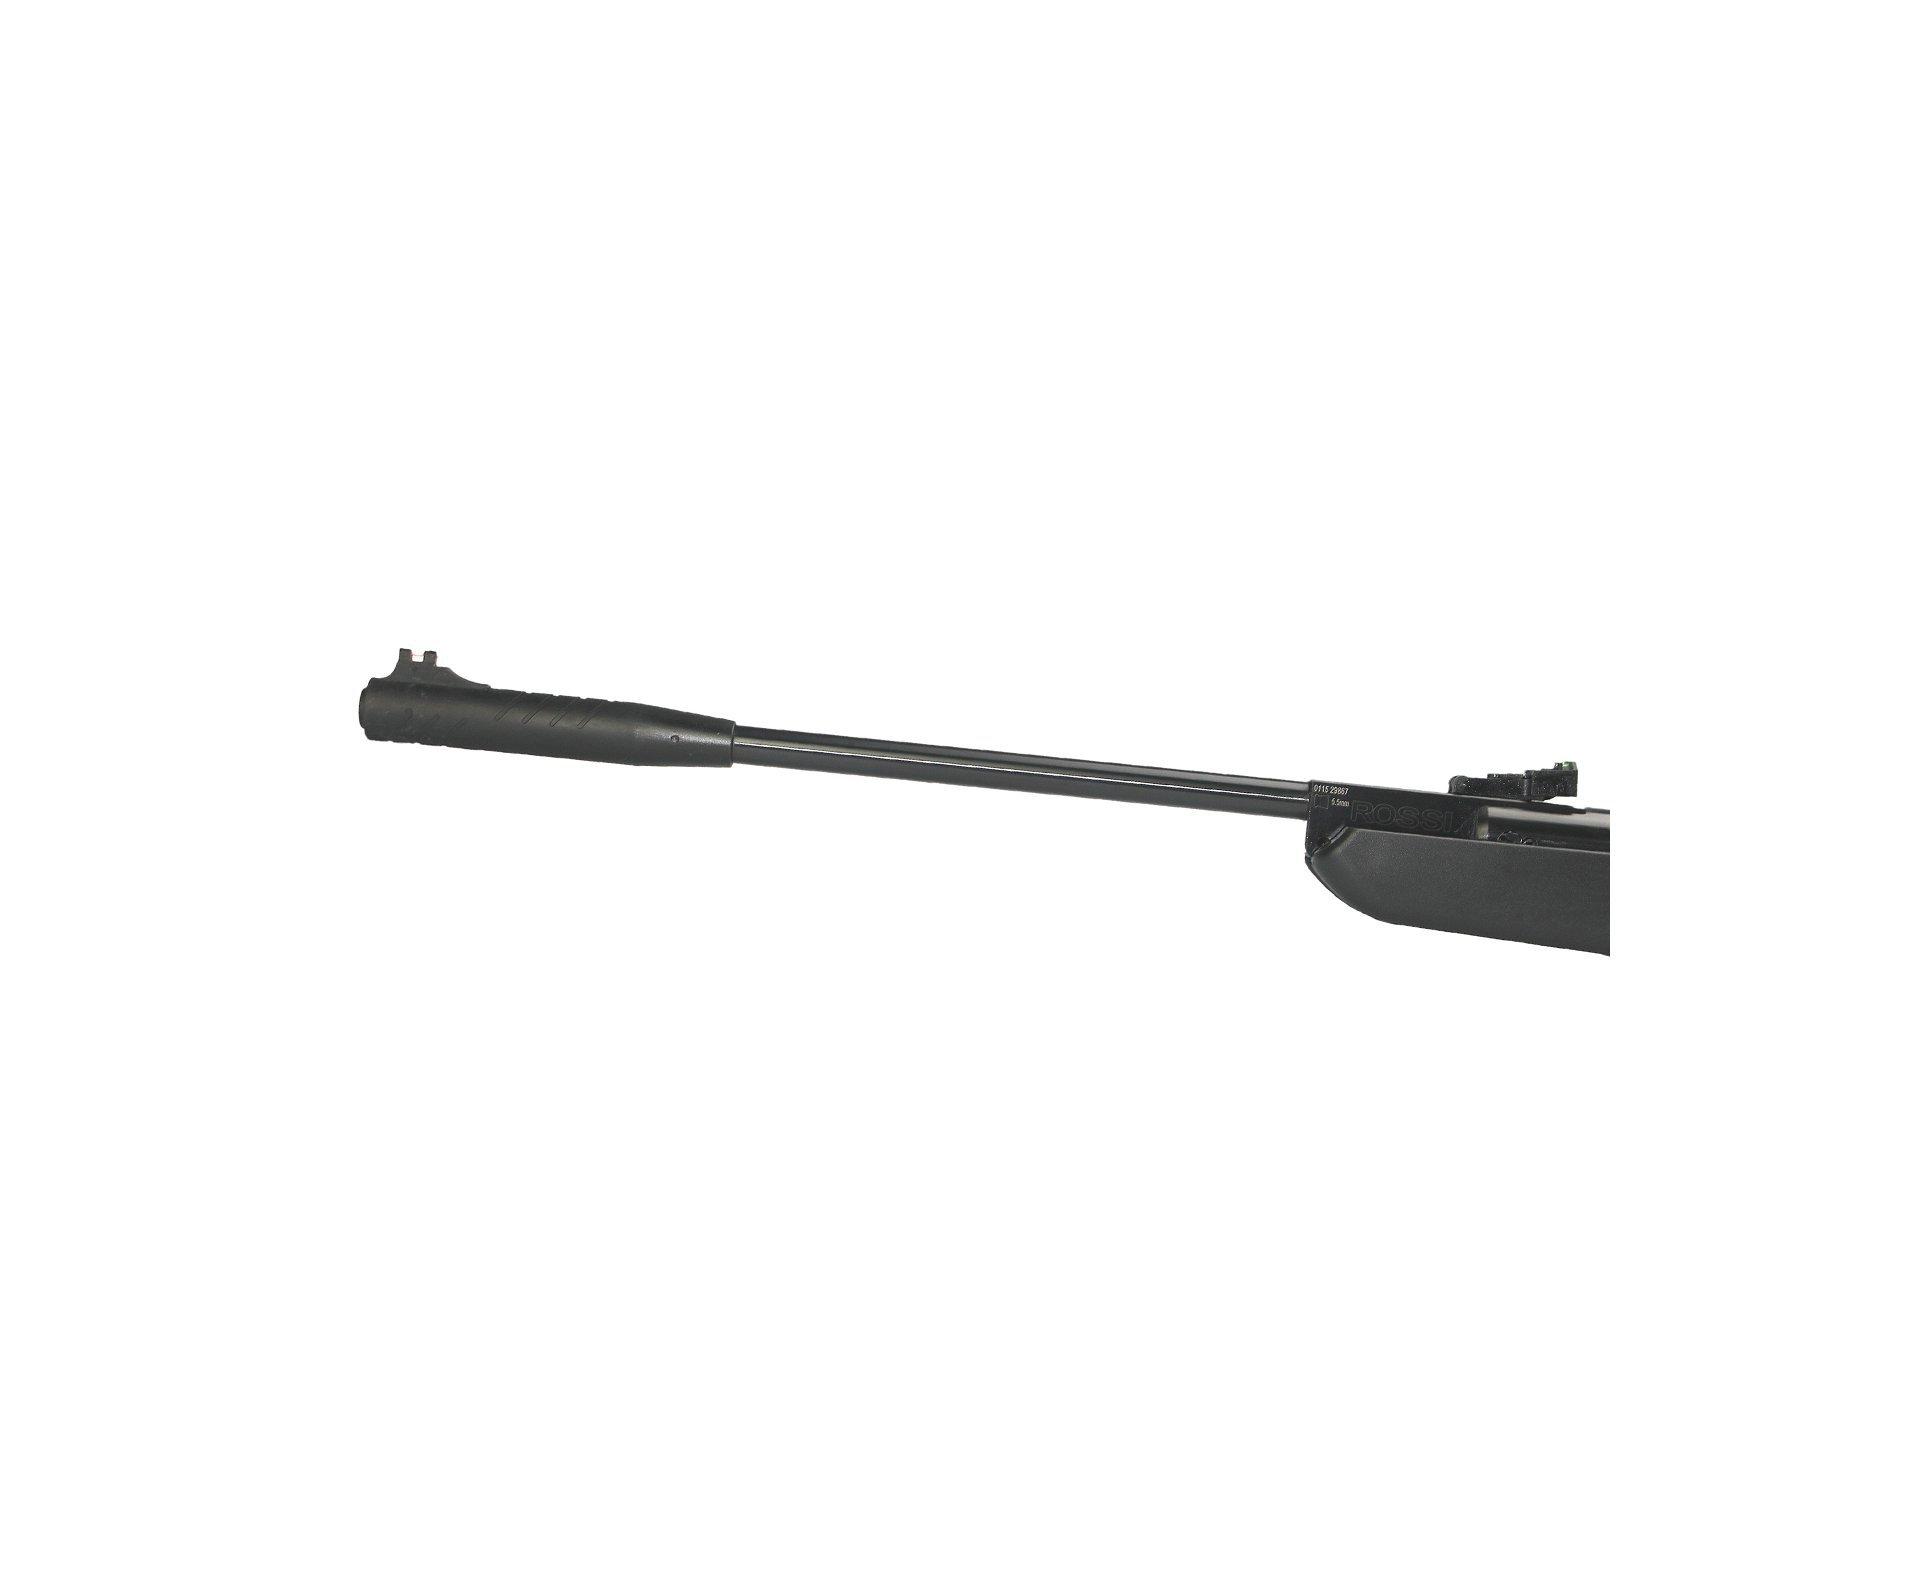 Carabina De Pressão Hatsan Ht 125 - Calibre 4,5 Mm - Sistema Sas